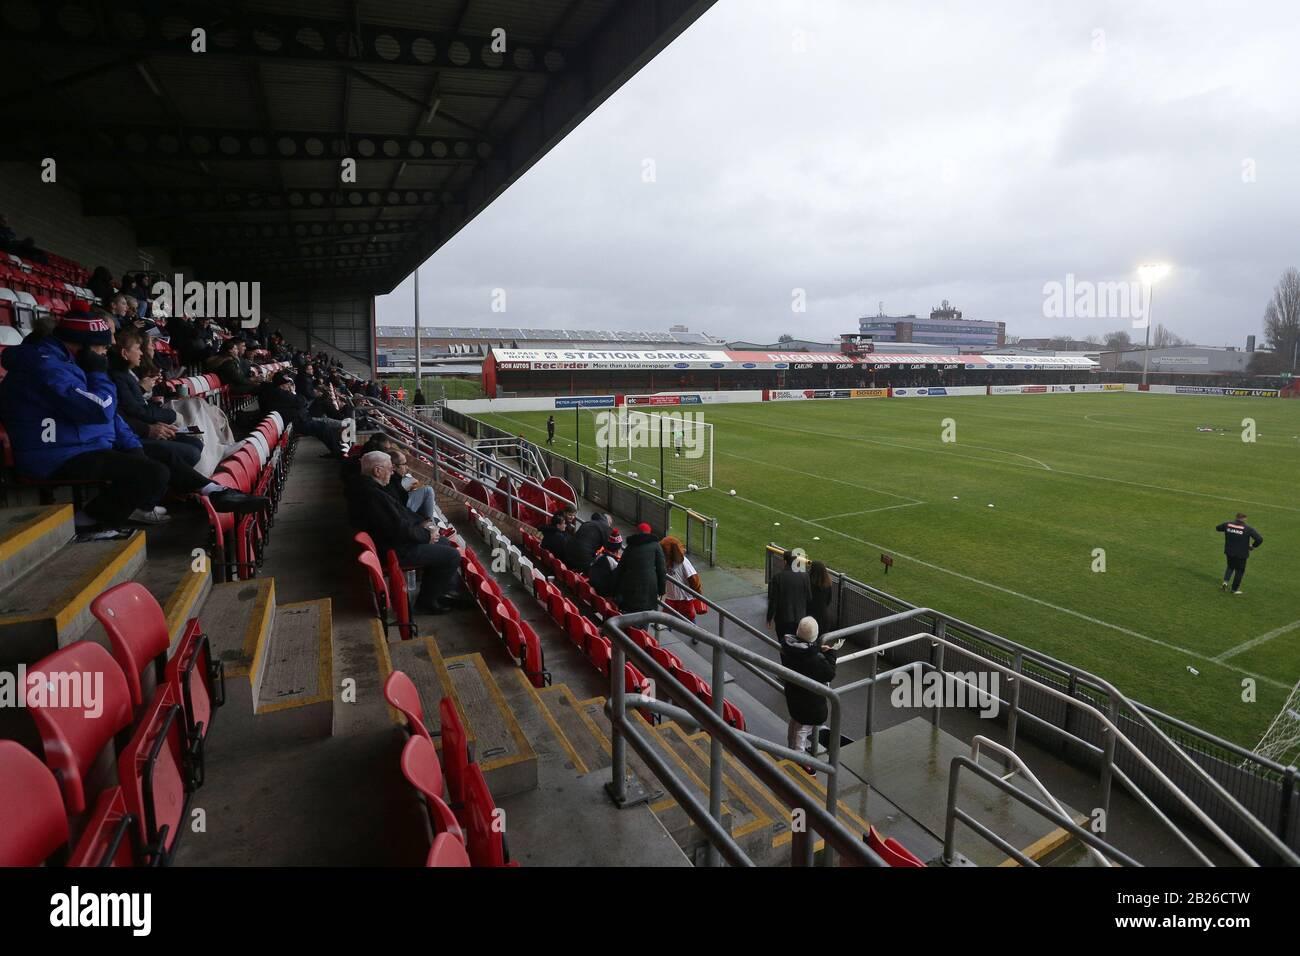 General view of the ground during Dagenham & Redbridge vs Ebbsfleet United, Vanarama National League Football at the Chigwell Construction Stadium on Stock Photo